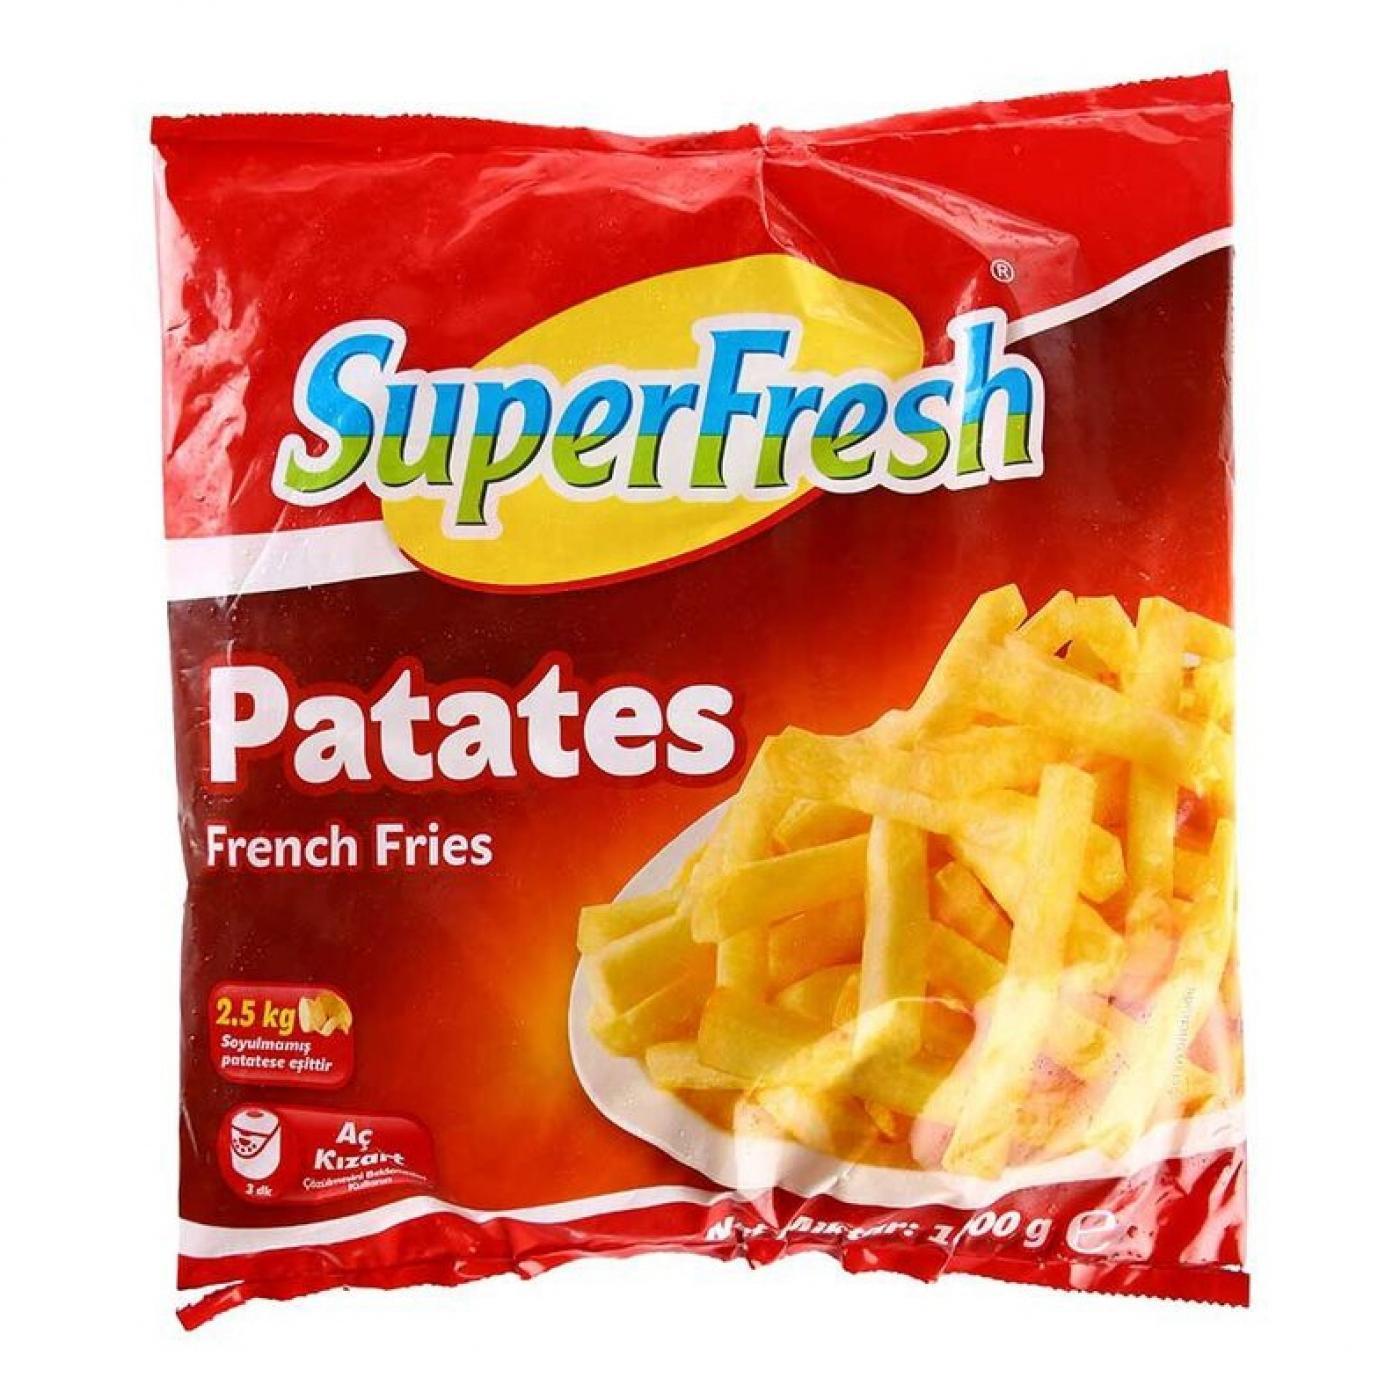 SUPERFRESH PATATES 1KG